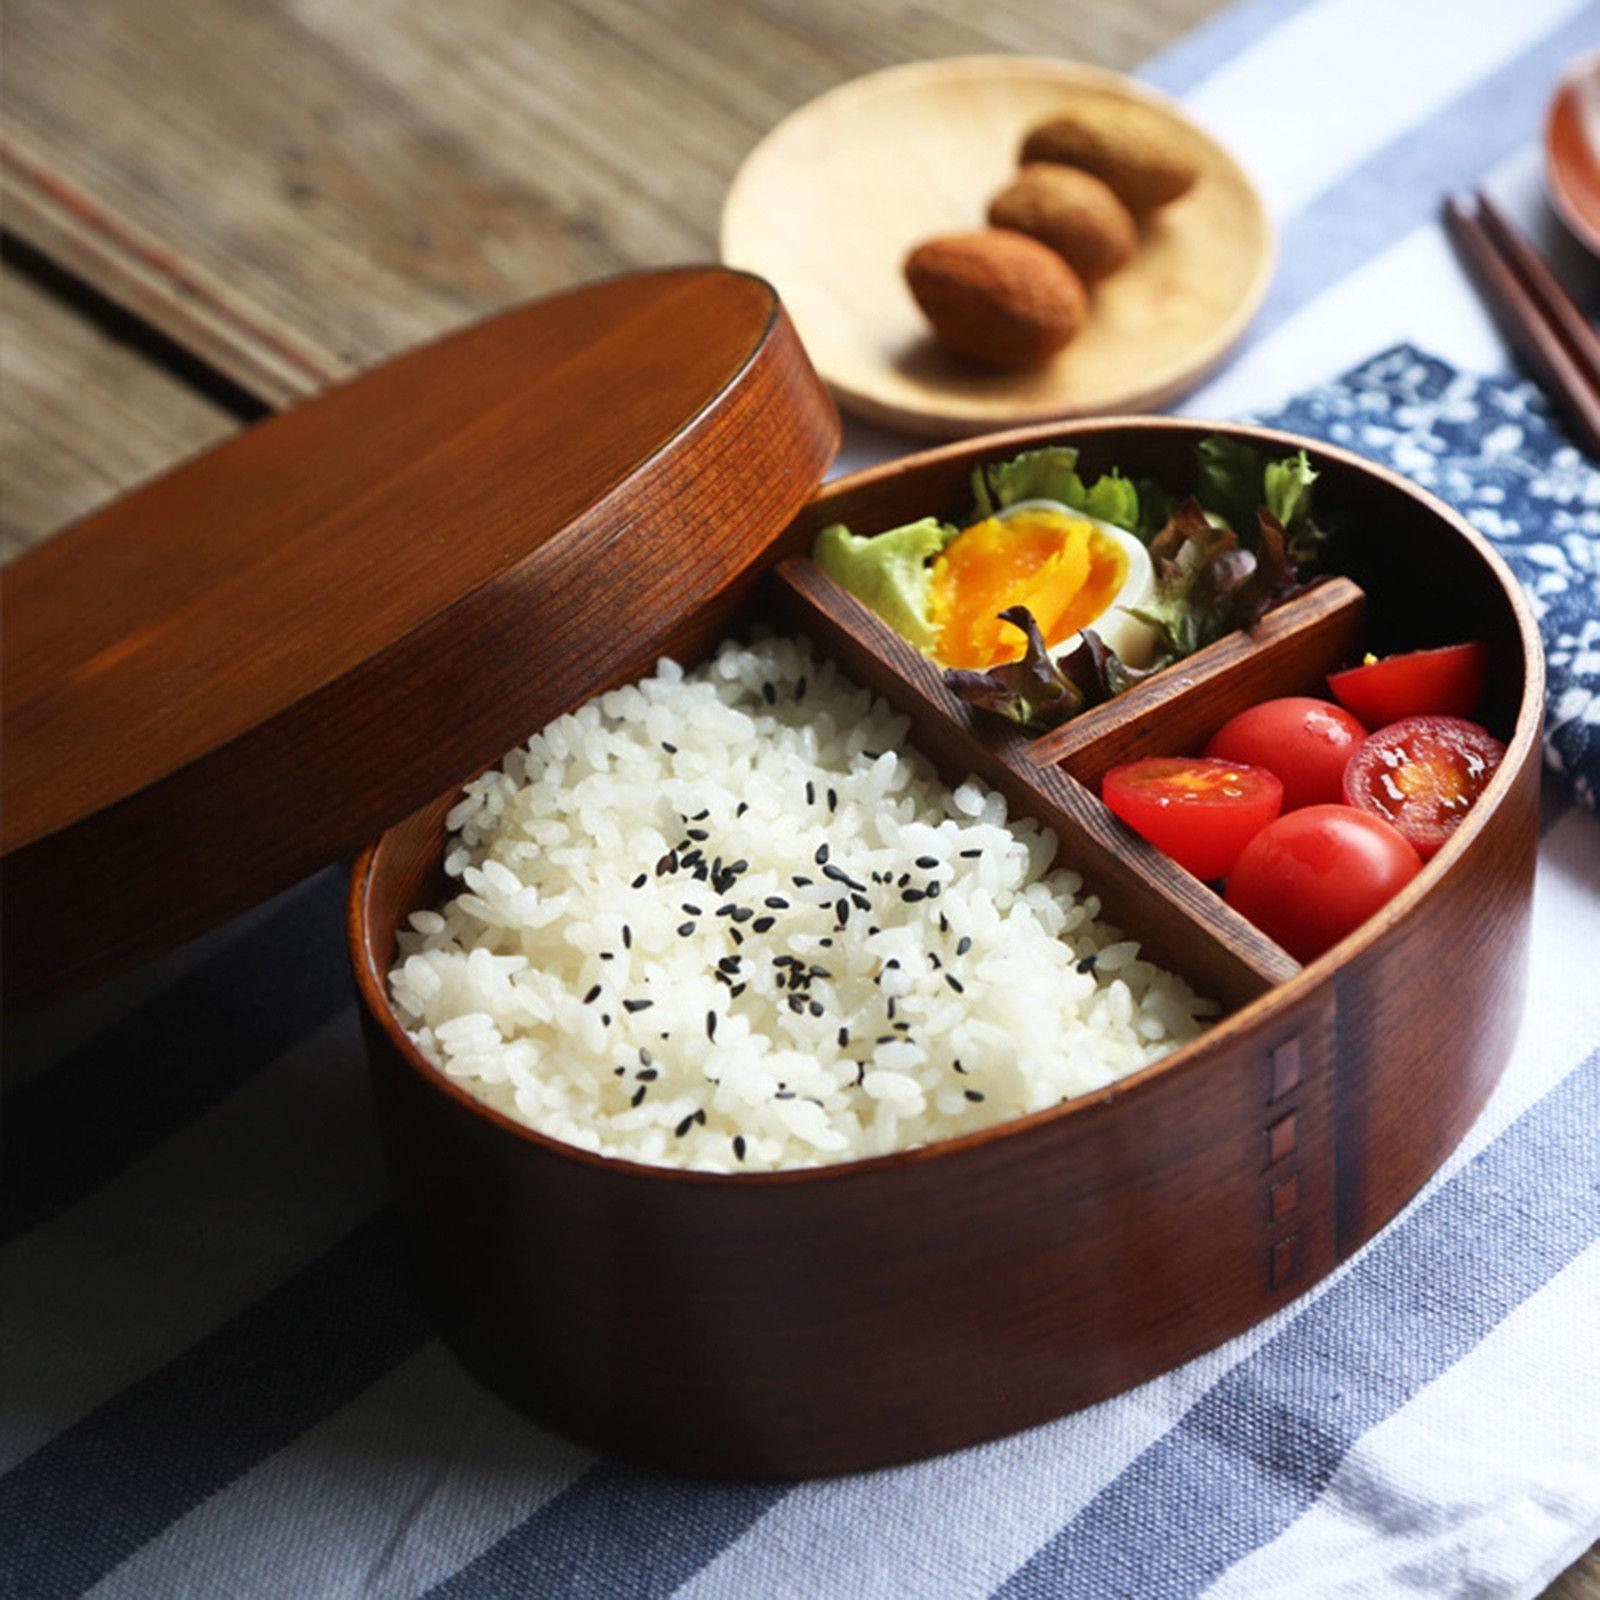 Caja bento japonesa de madera tradicional